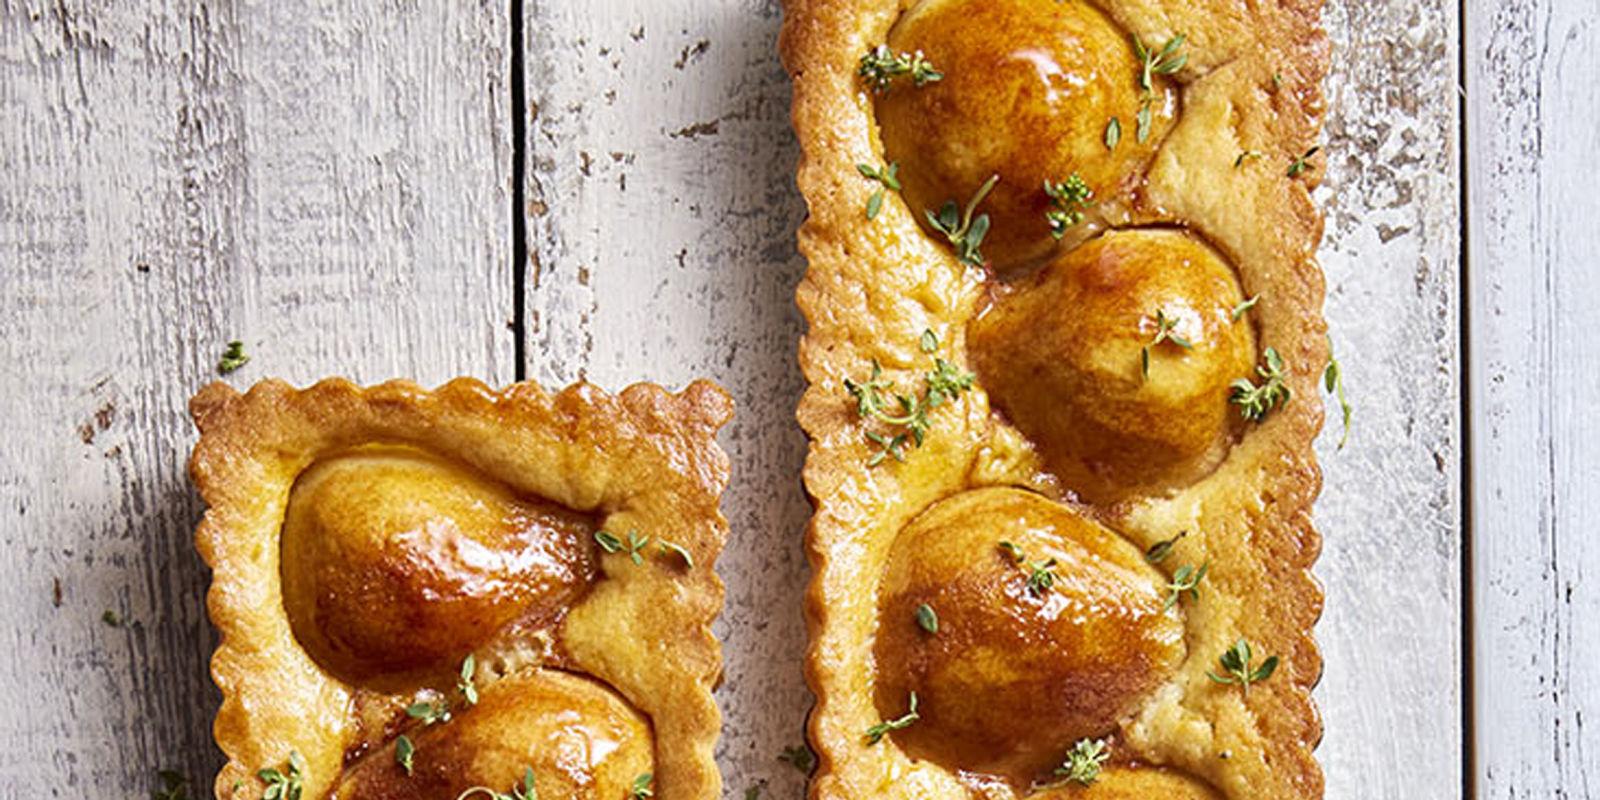 how to make lemon tart at home